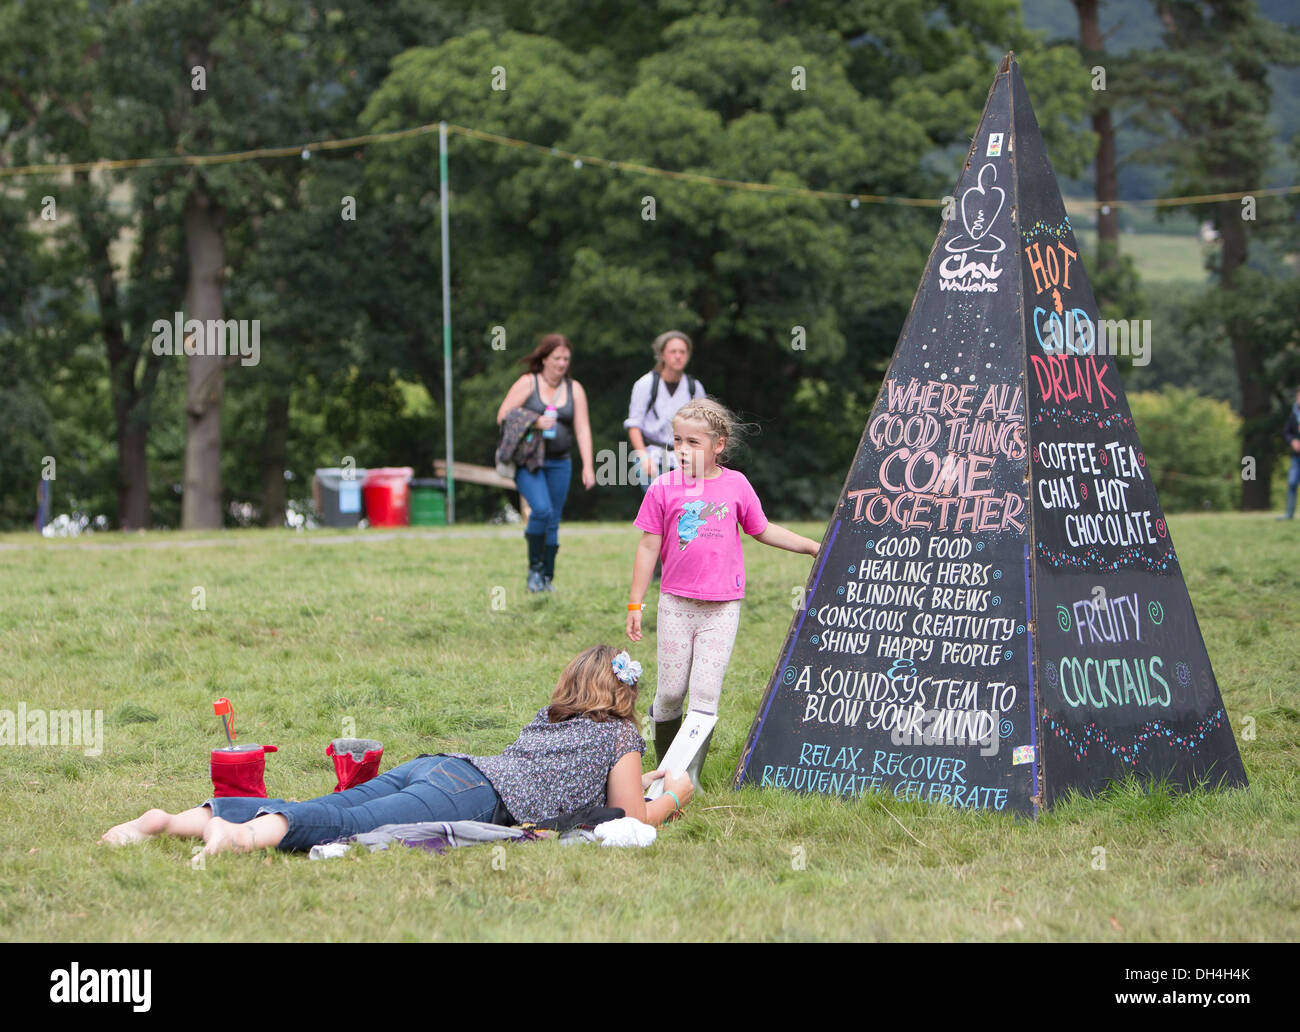 Festival goers take a well earned break at the Green Man Festival on the Glan Usk Estate, Crickhowell. - Stock Image